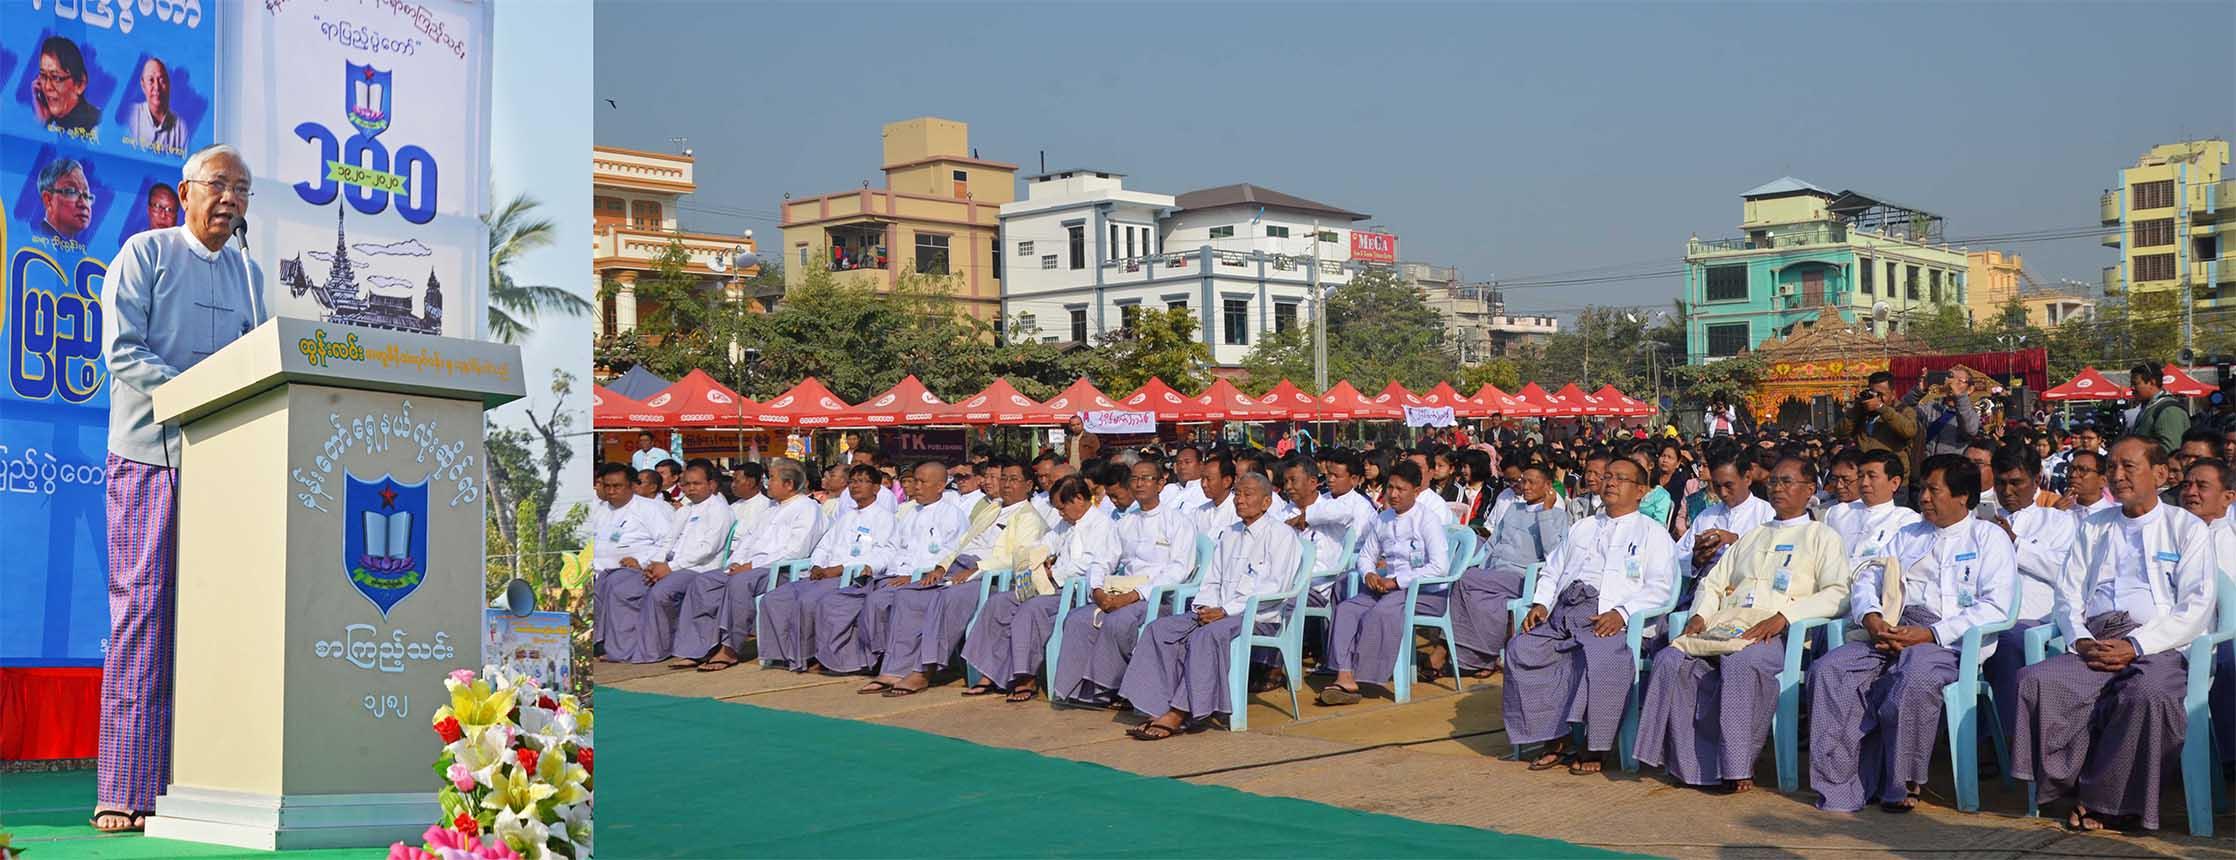 Former President U Htin Kyaw delivers the speech at the centenary celebration of Nandawshae Reading Association.Photo: Aung Phyo Kyaw